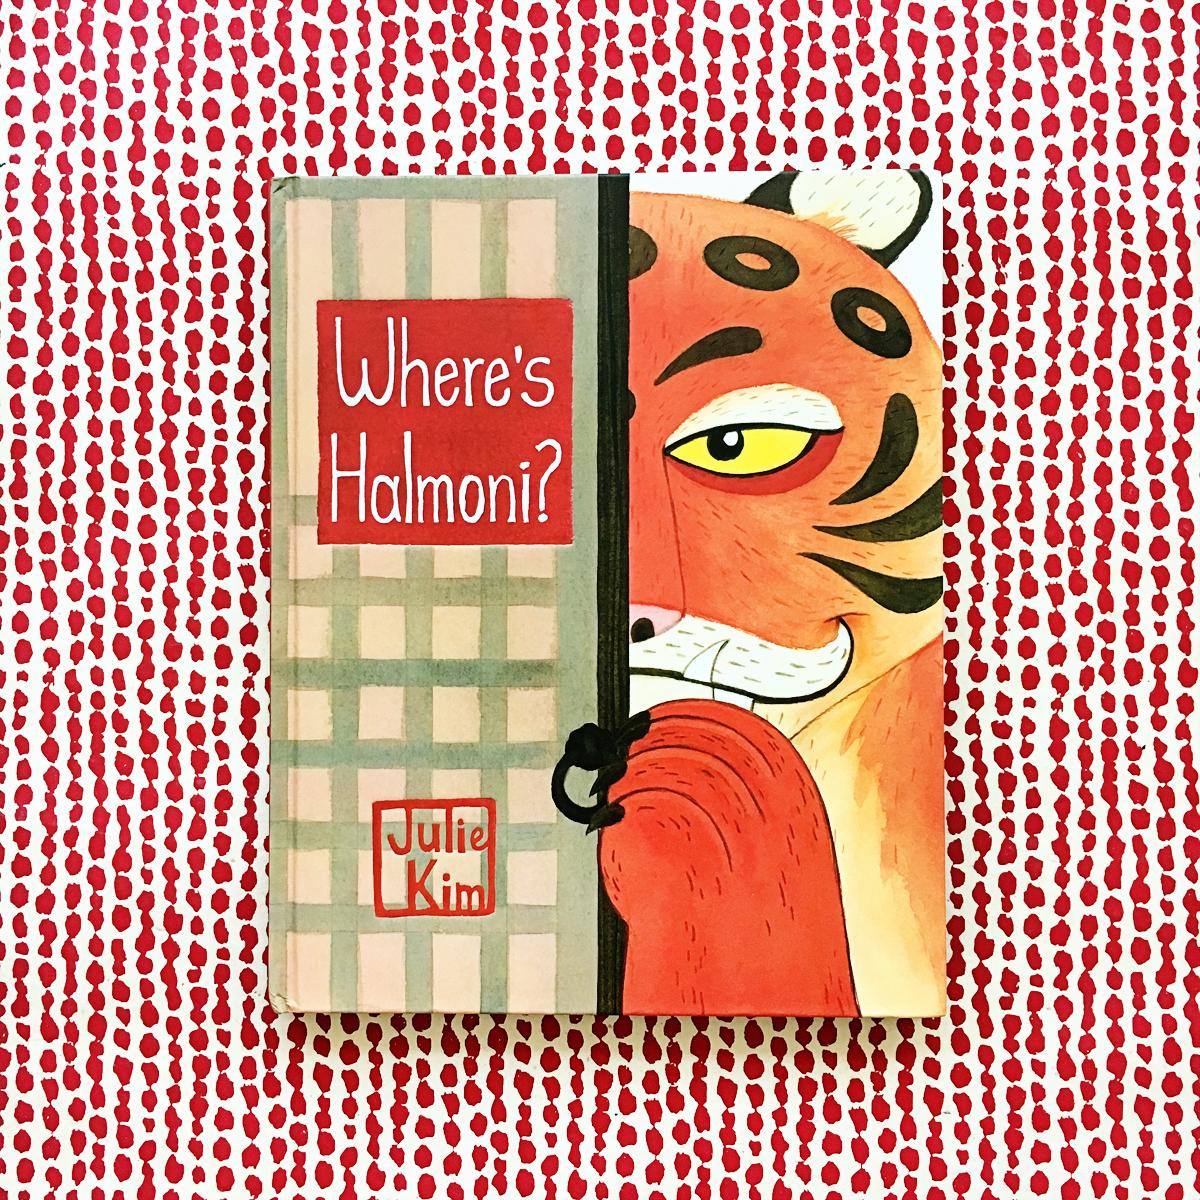 Where's Halmoni? | Books For Diversity